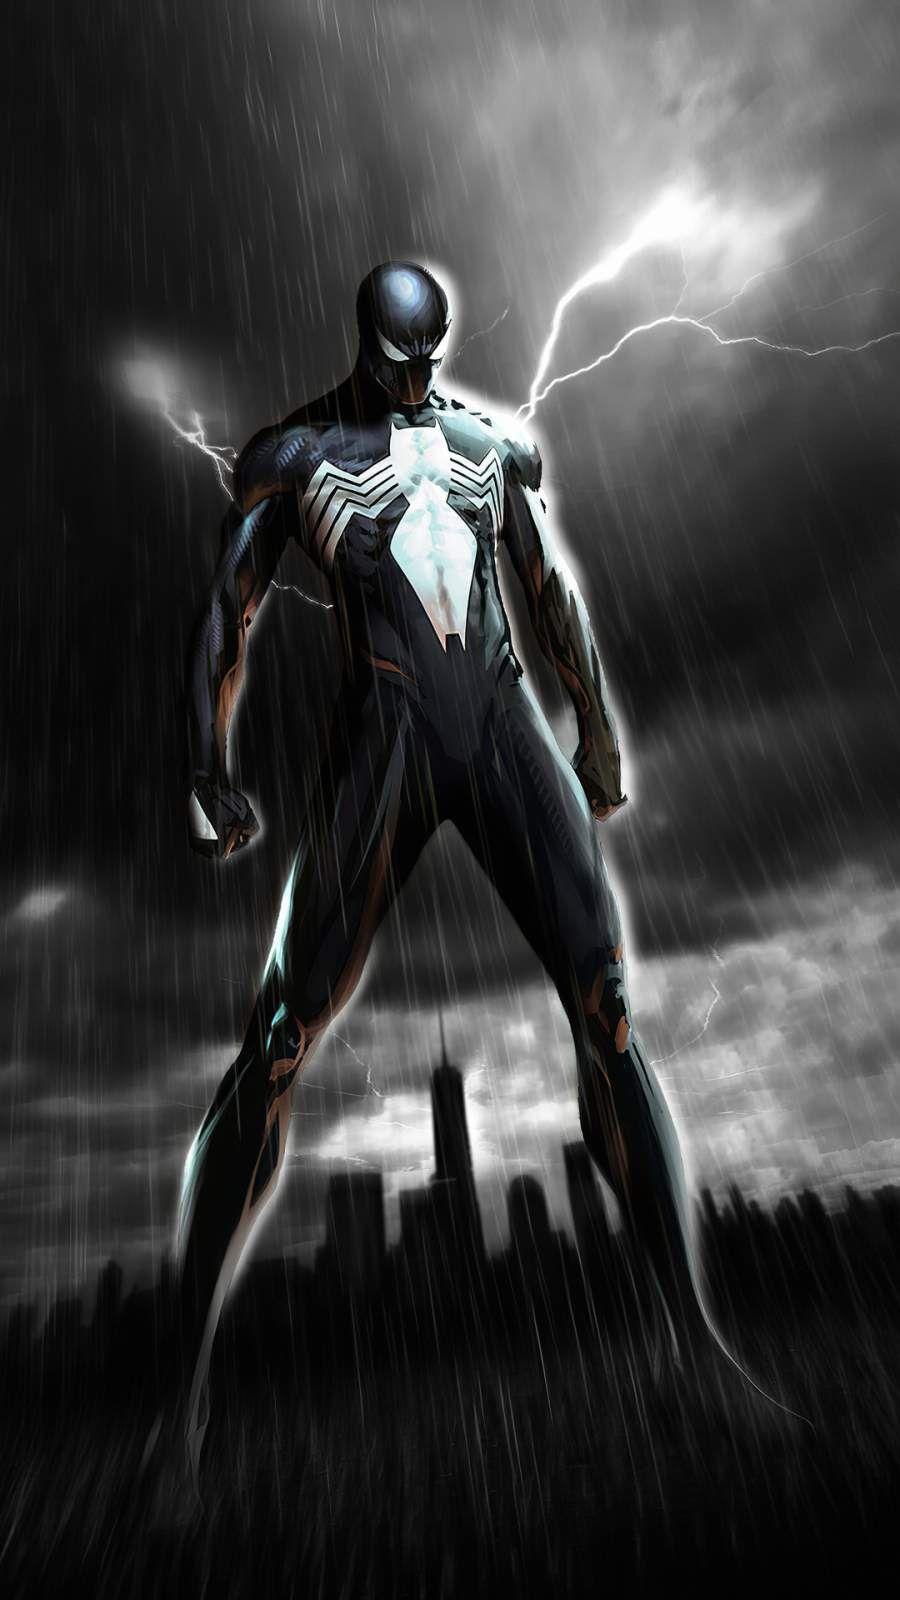 Venom Spiderman Iphone Wallpaper Venom Spiderman Symbiote Spiderman Marvel Comics Wallpaper